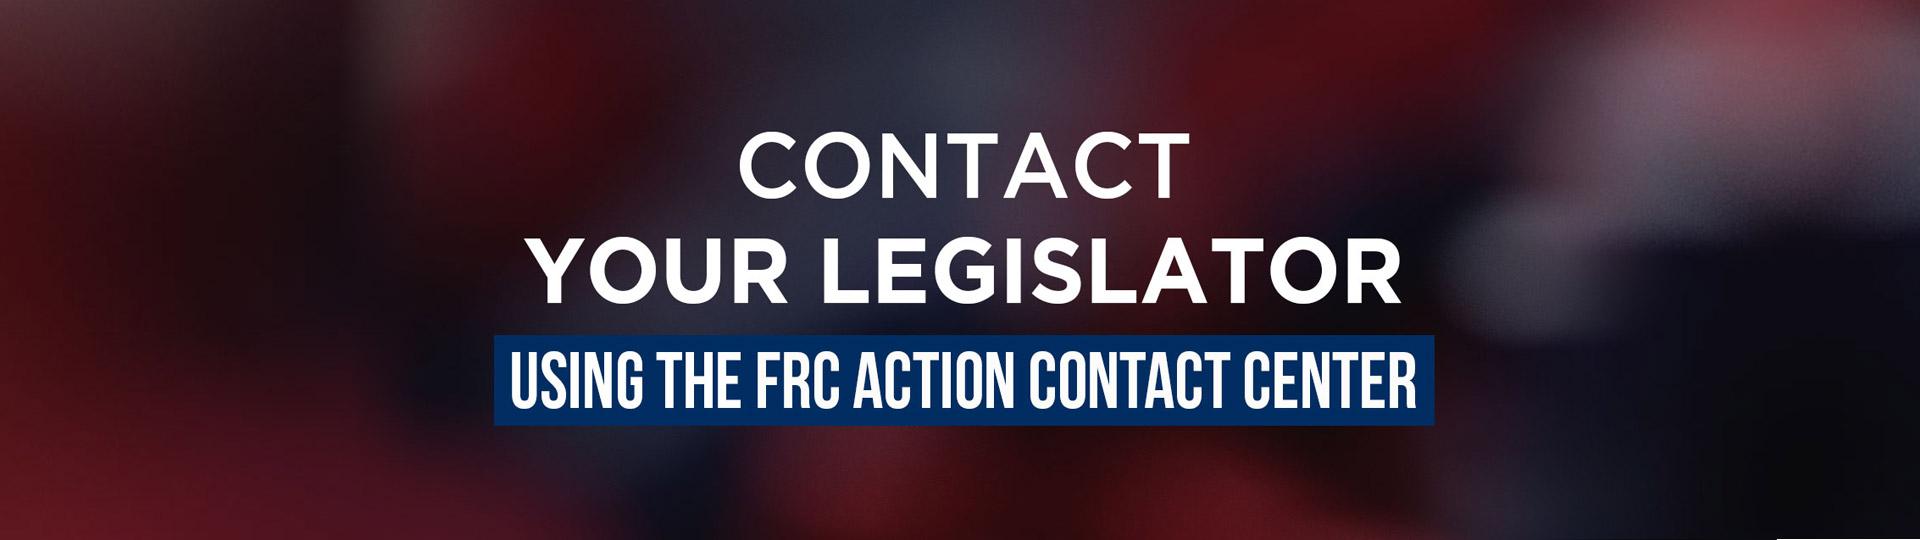 Contact Your Legislator